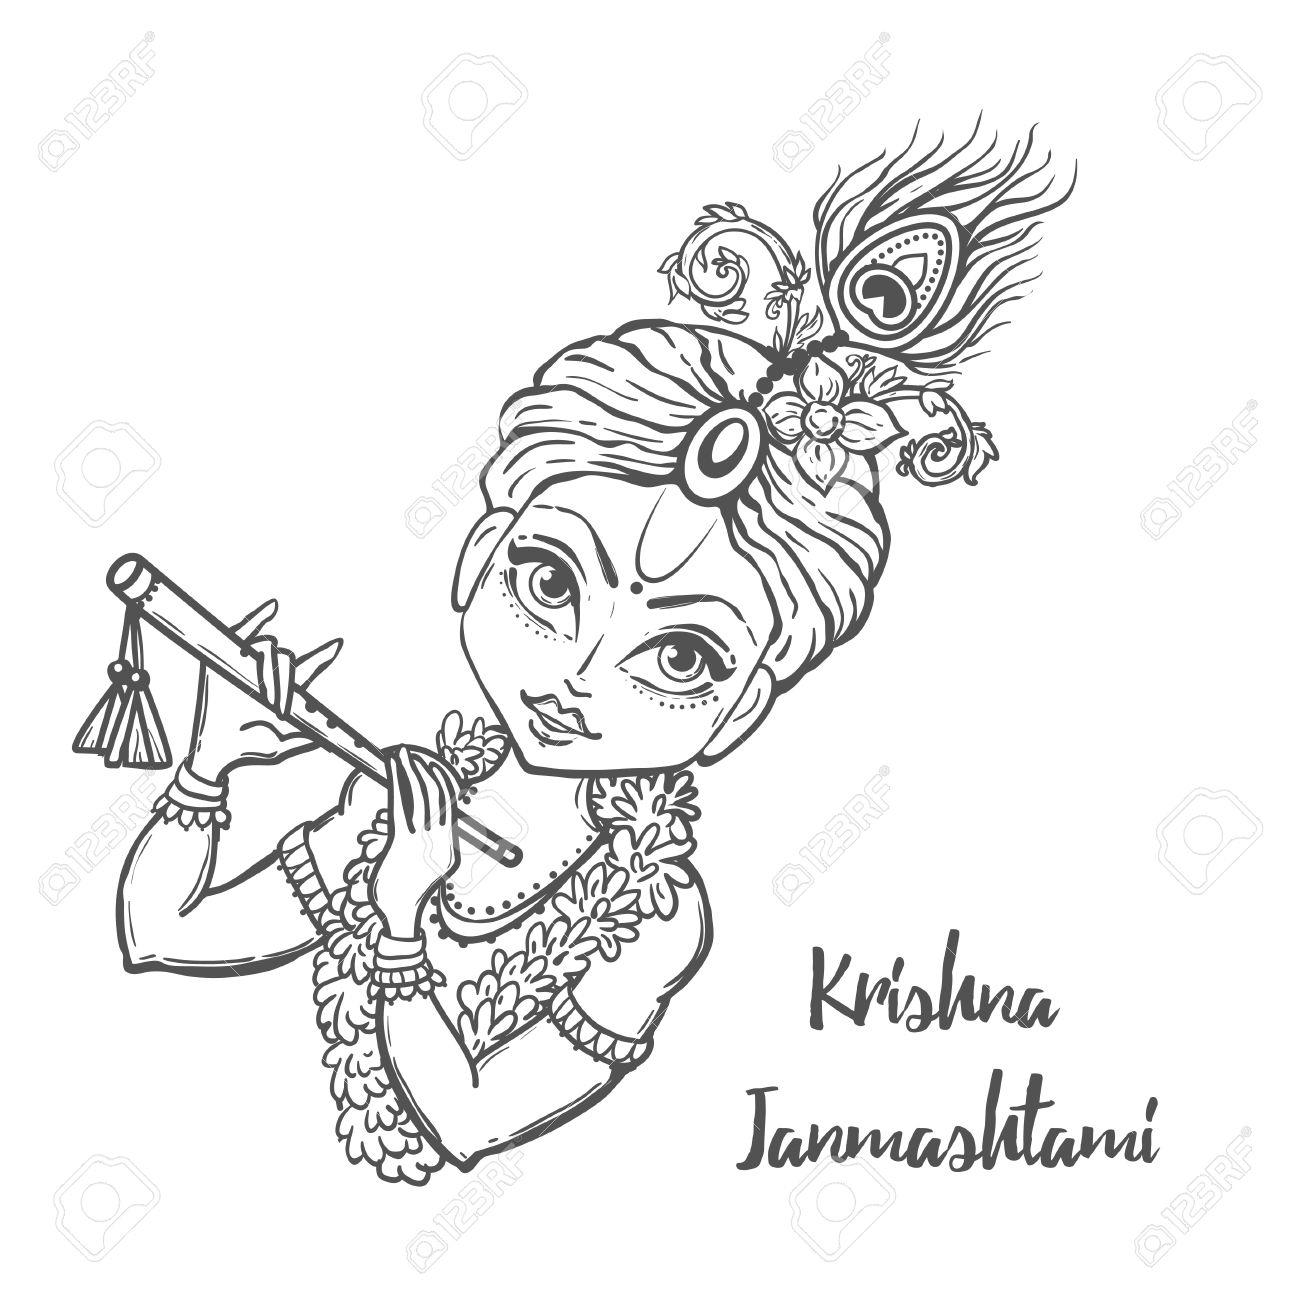 1300x1300 Shri Krishna Cartoon Drawings Sketches Ornament Card With Lord